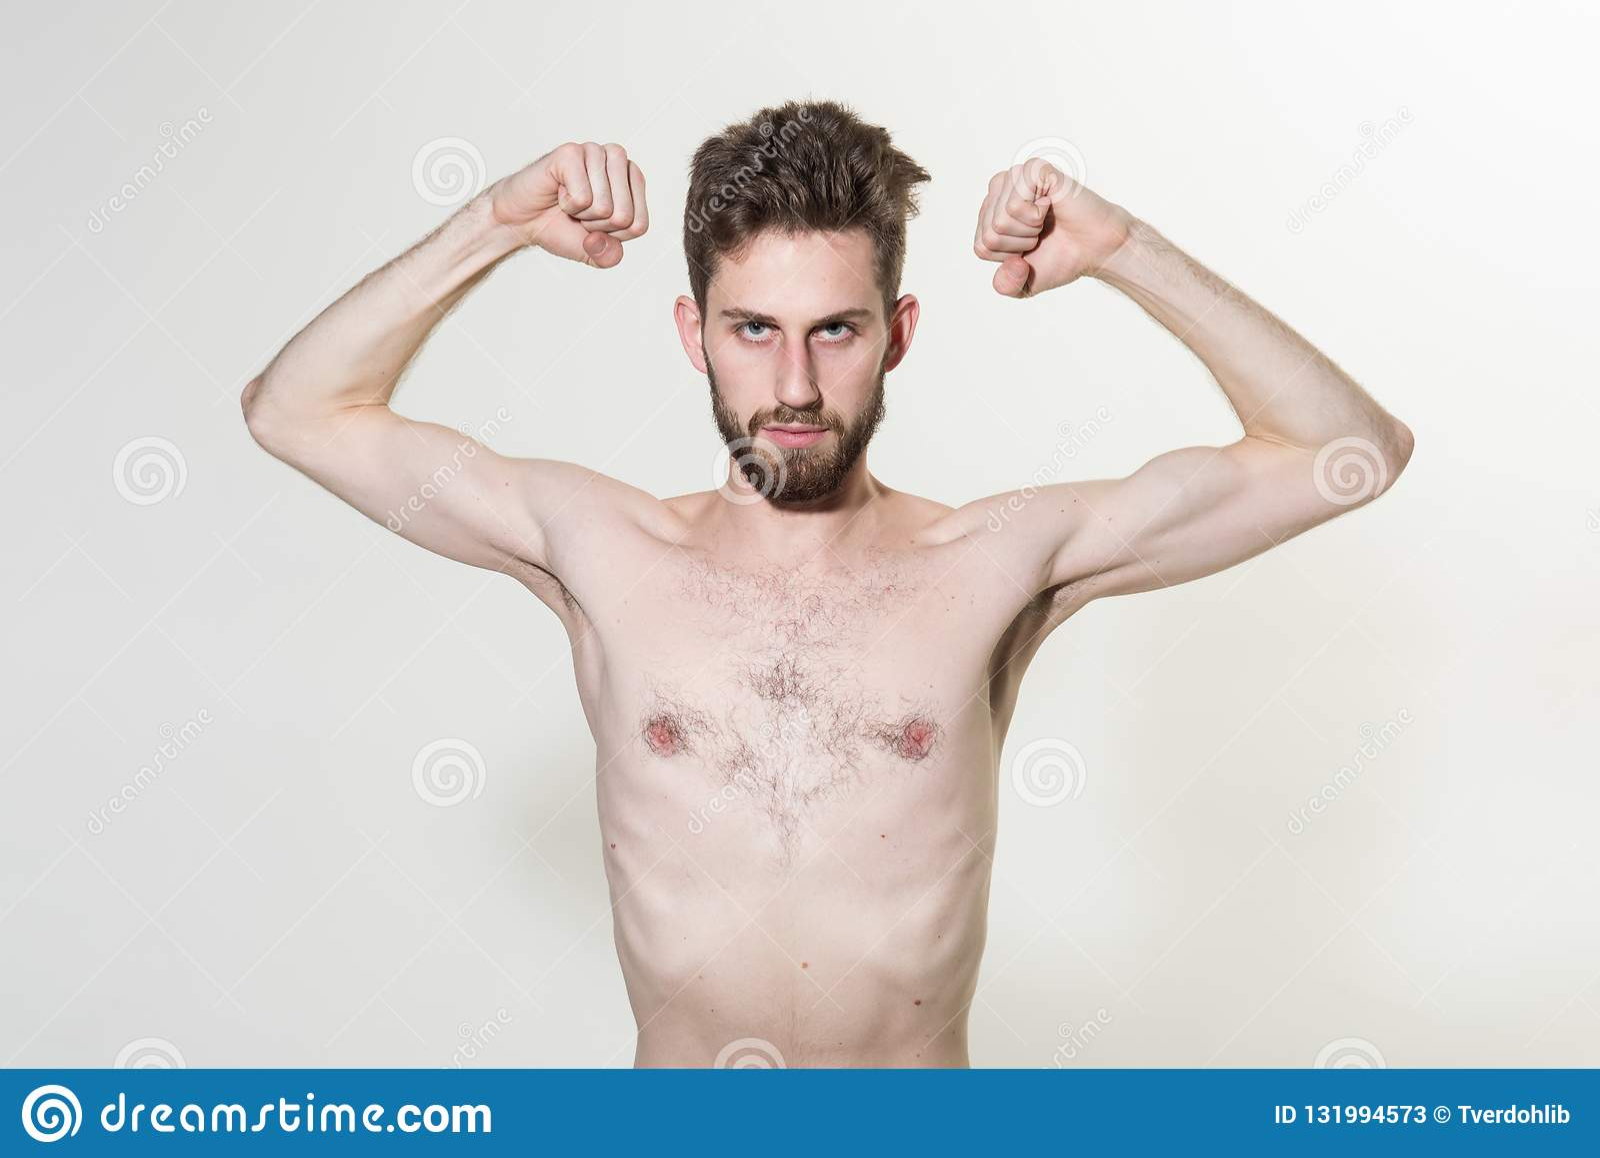 Skinny Young Man Flex Arms  Slim Man Do Sport Training  Stimulating